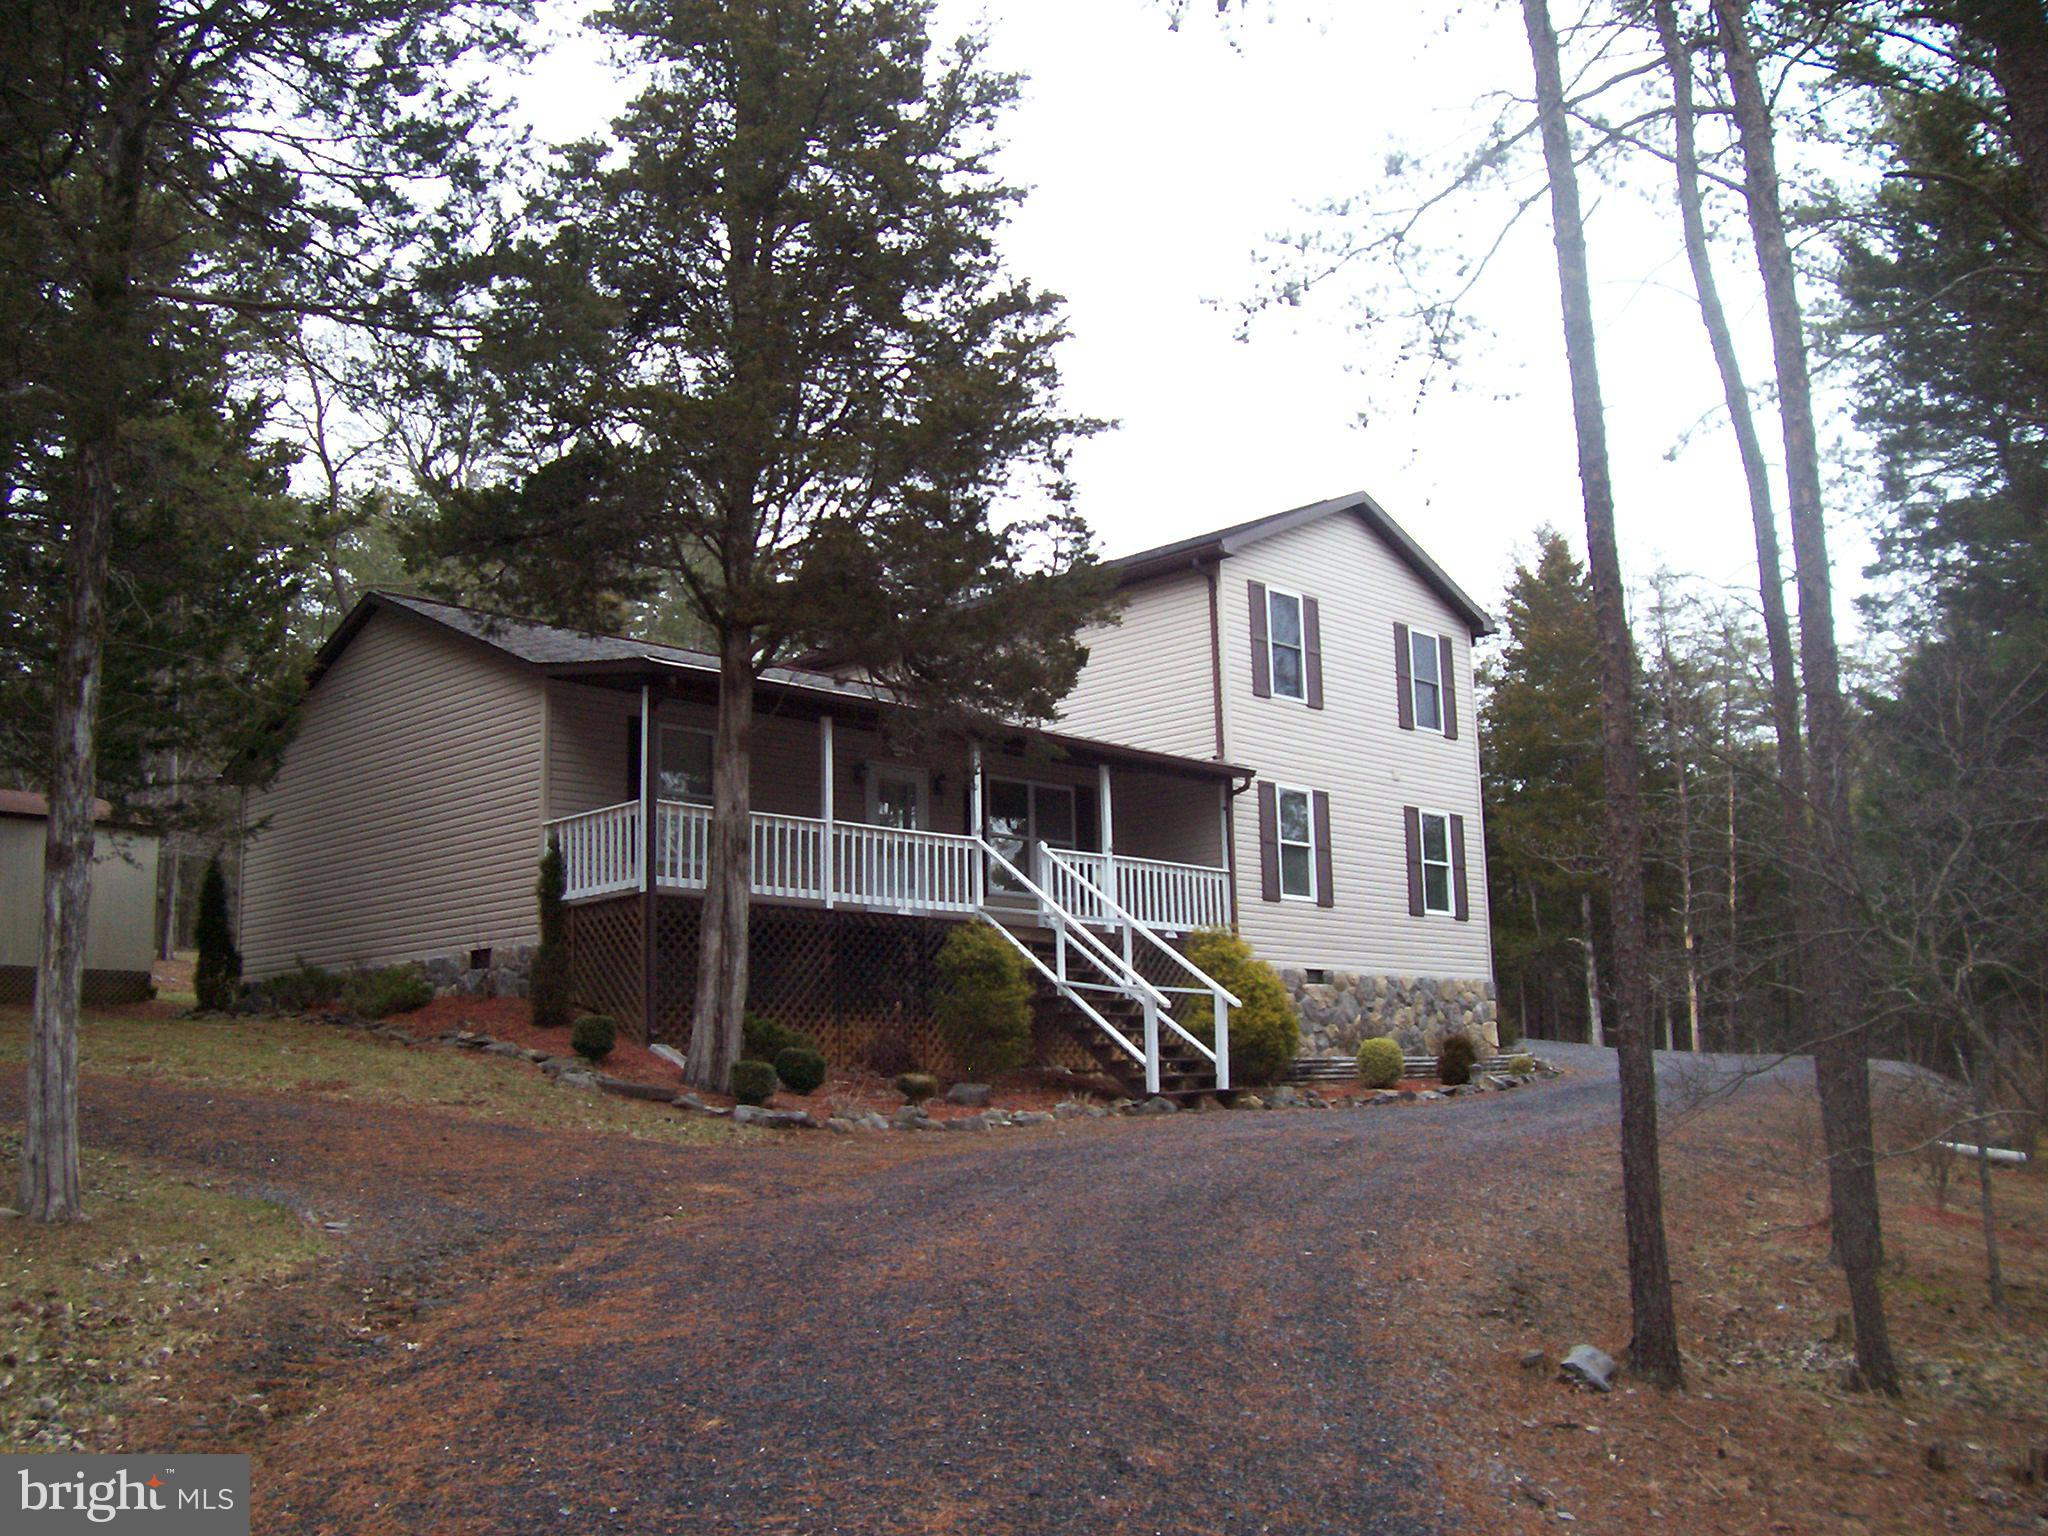 963 Honeymoon Hollow, Lost River, WV 26810